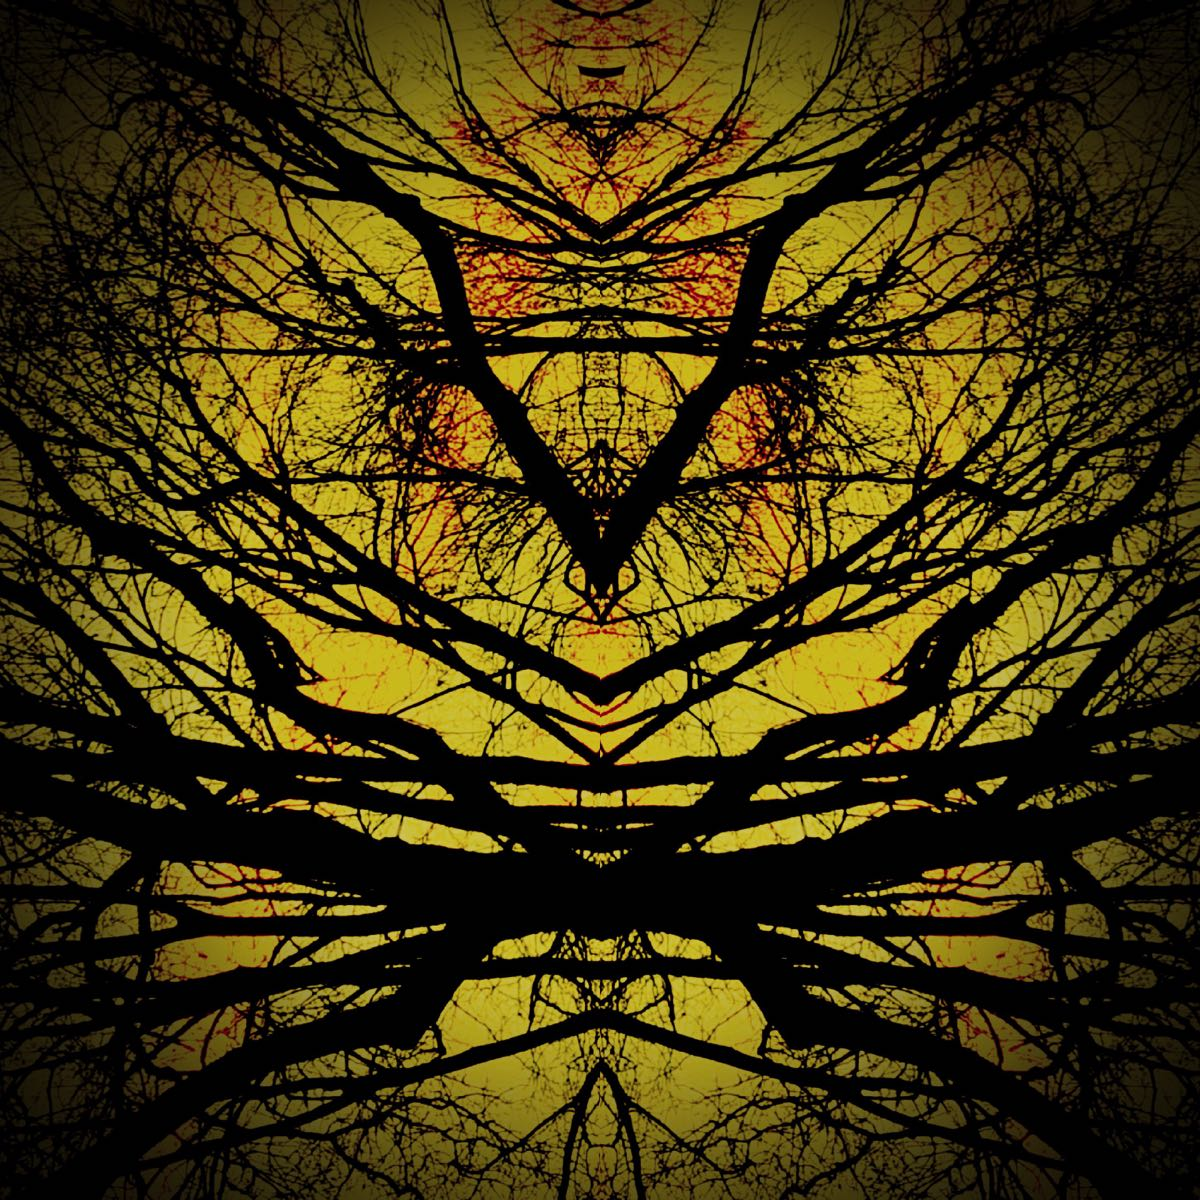 Subconscious - Tree Creatures #1 (40x40 cm) - Print on cotton paper 2020